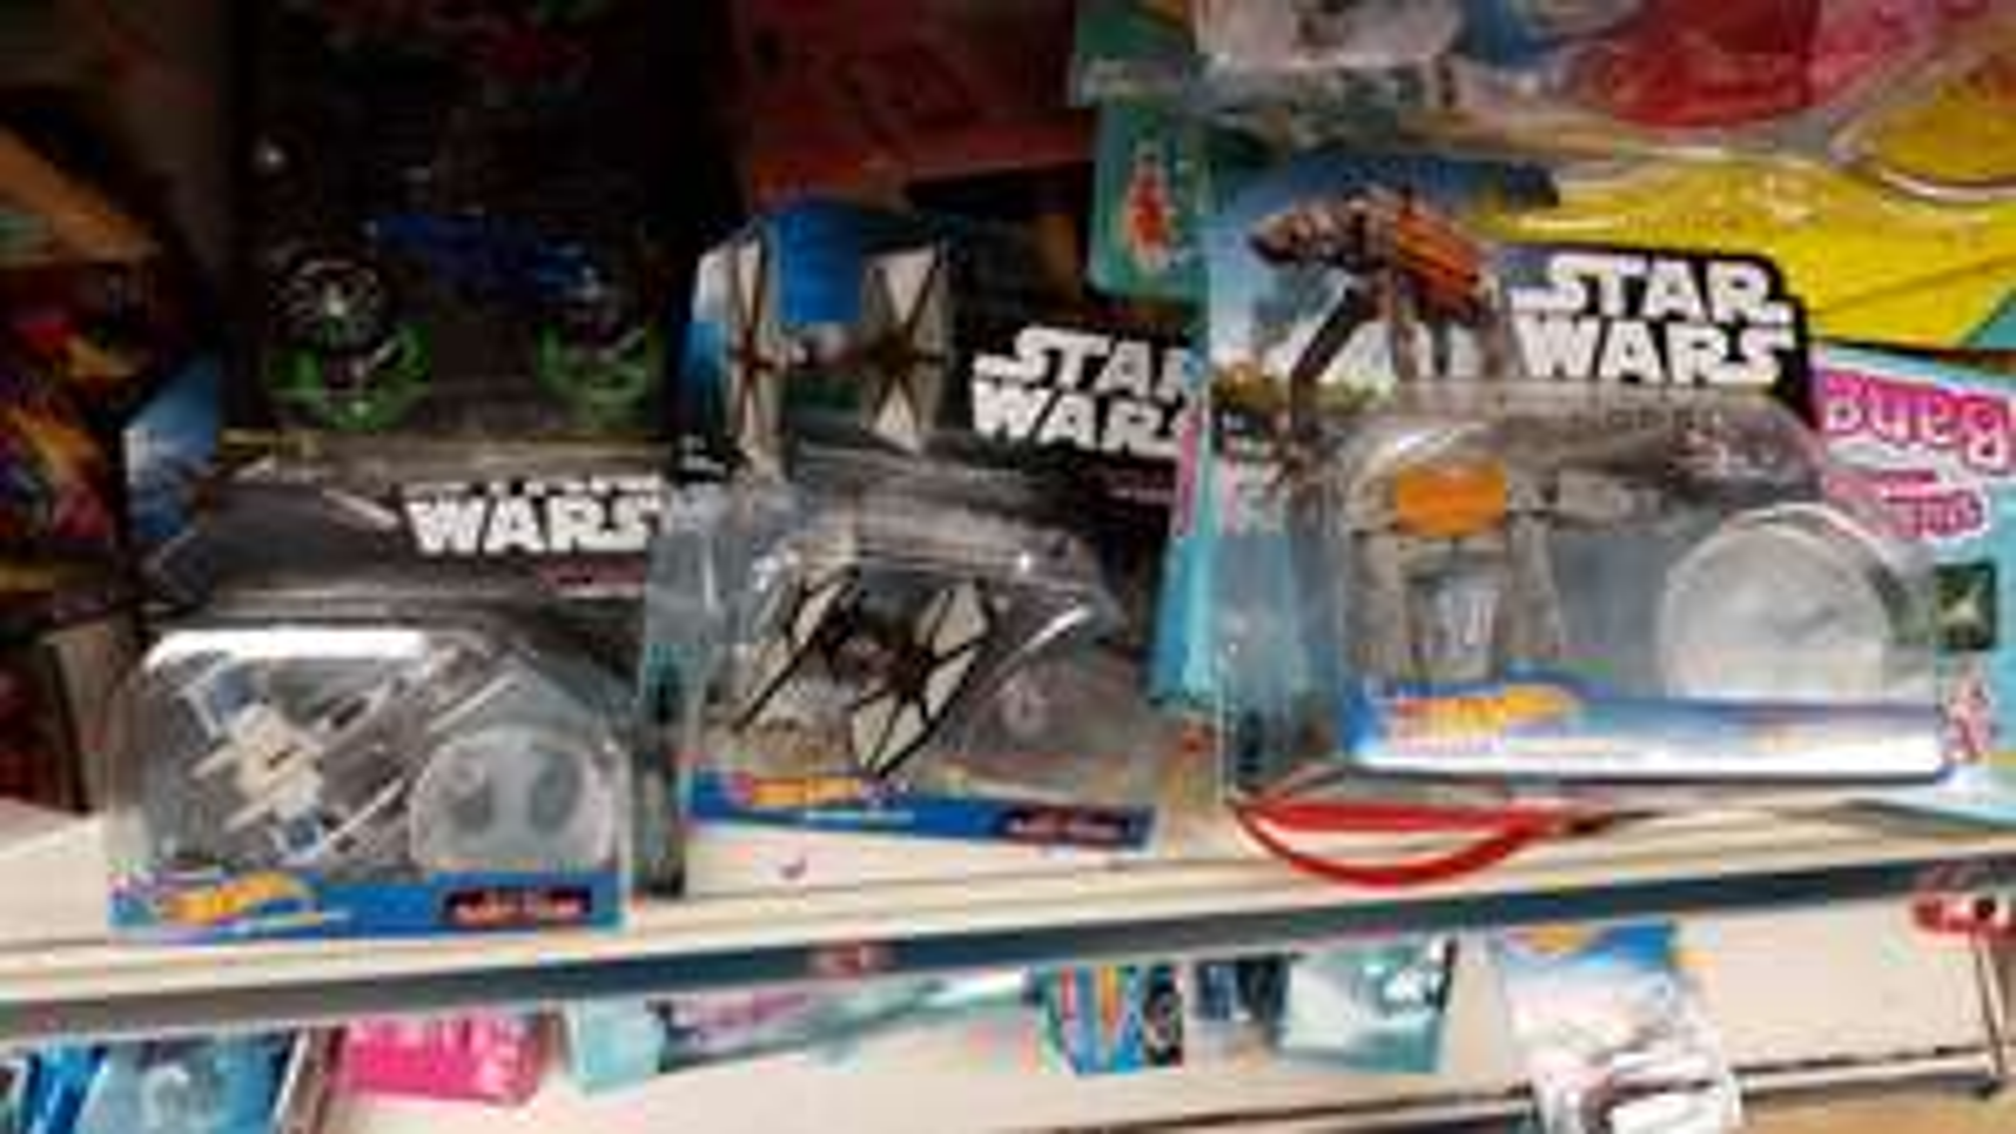 Hotwheels Star Wars space ships £1 @ Poundland Stratford